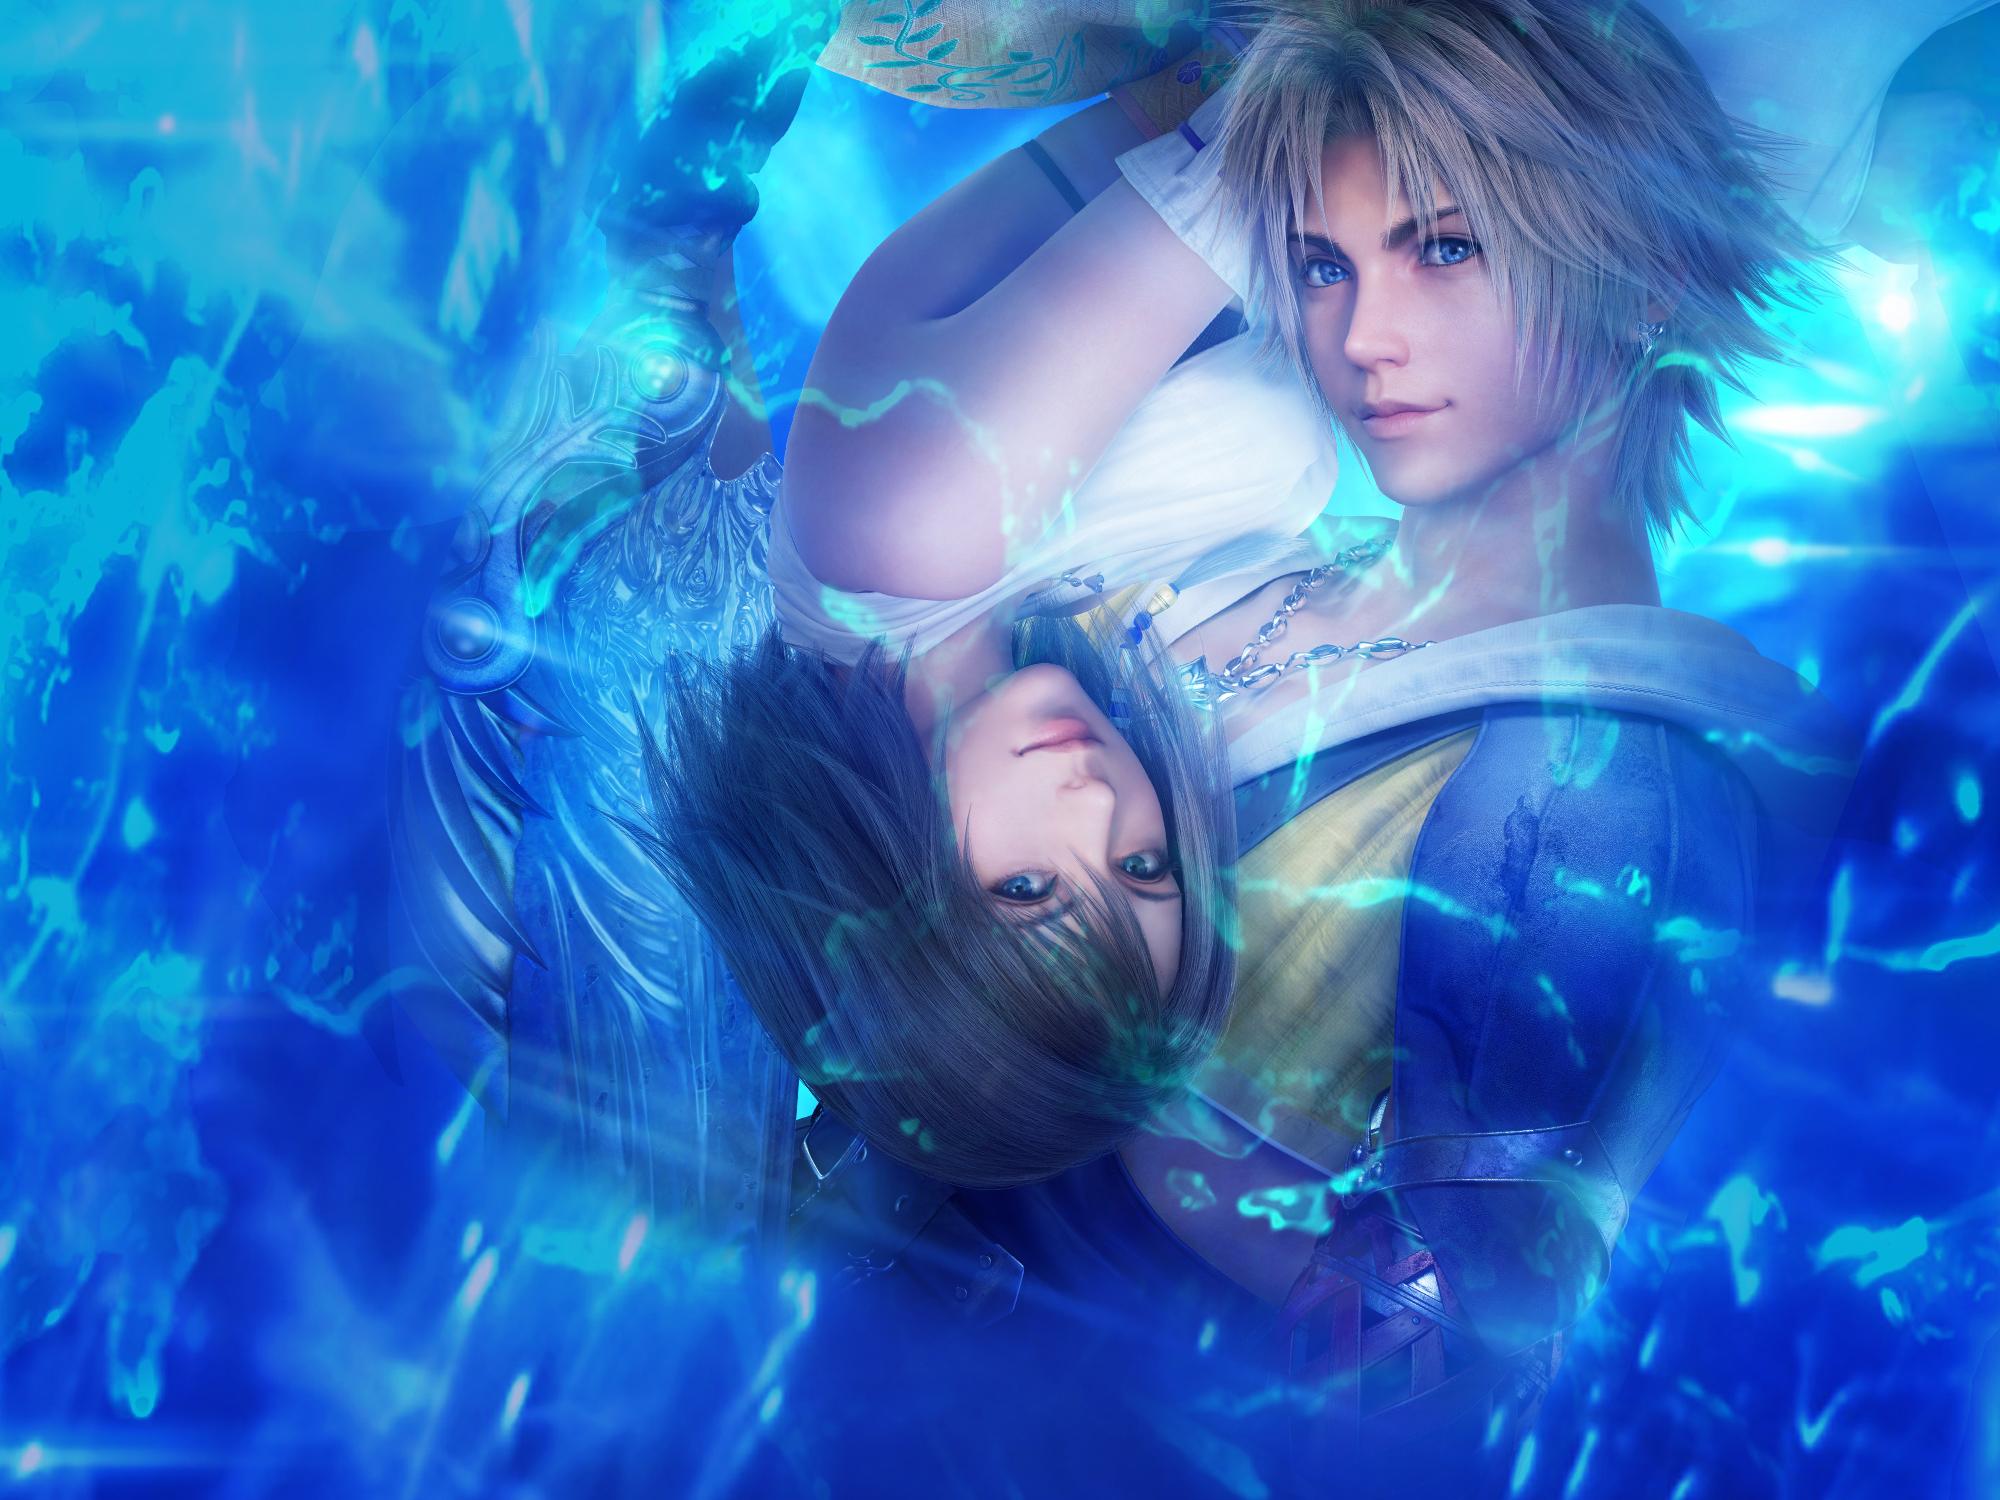 Final Fantasy X Allusions Final Fantasy Wiki Fandom Powered By Wikia